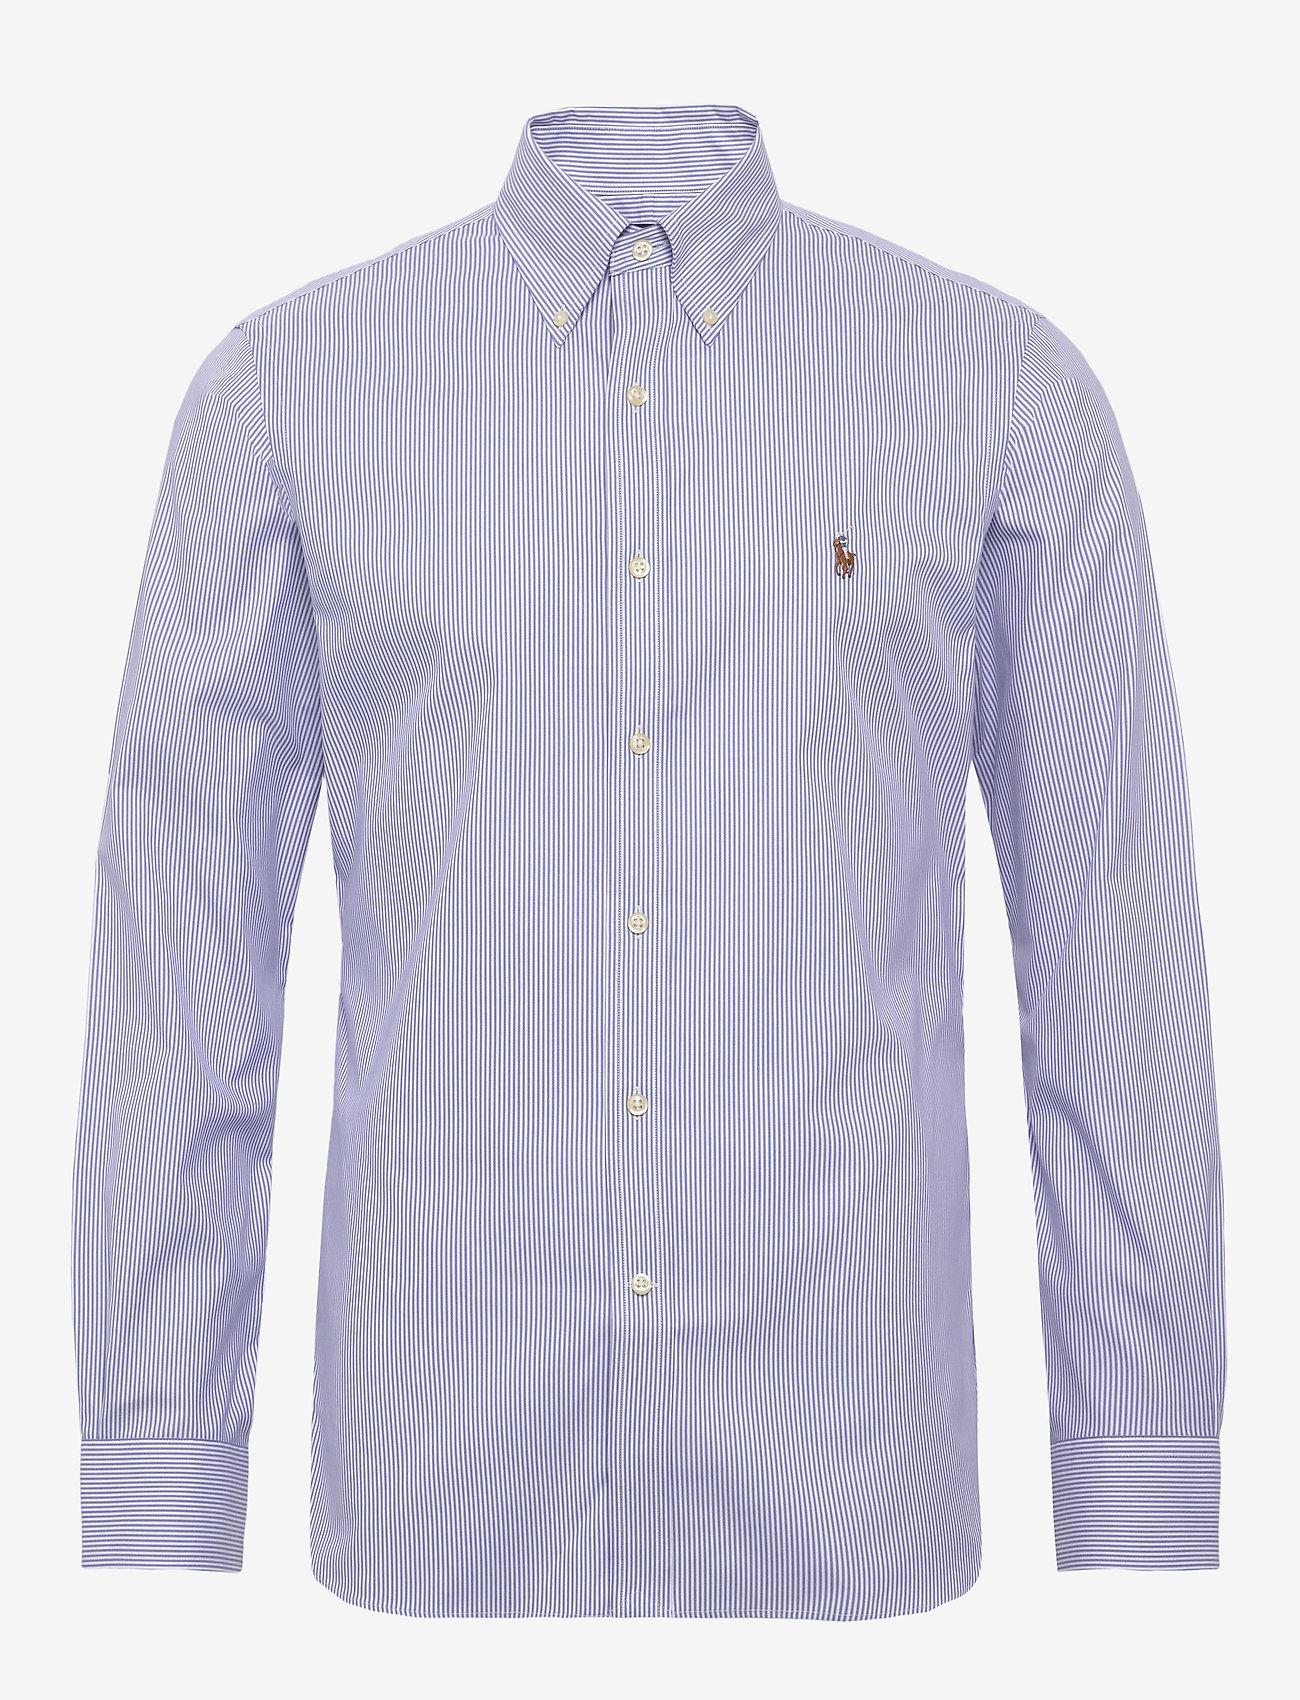 Polo Ralph Lauren - Slim Fit Striped Oxford Shirt - business shirts - 3155b blue/white